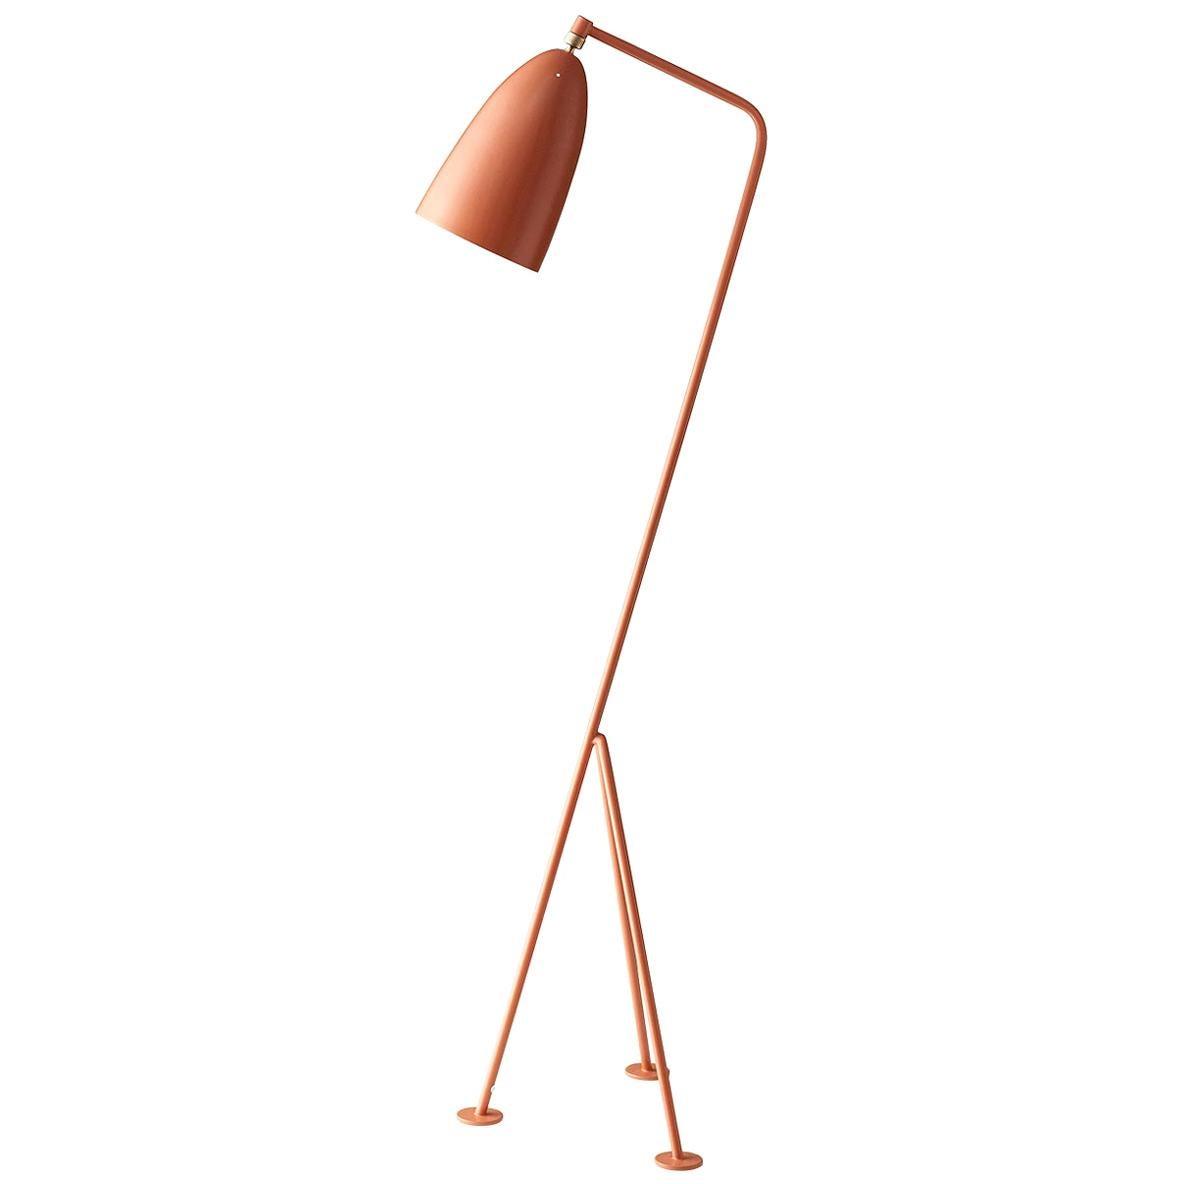 Greta Grossman Grasshopper Floor Lamp - Vintage Red